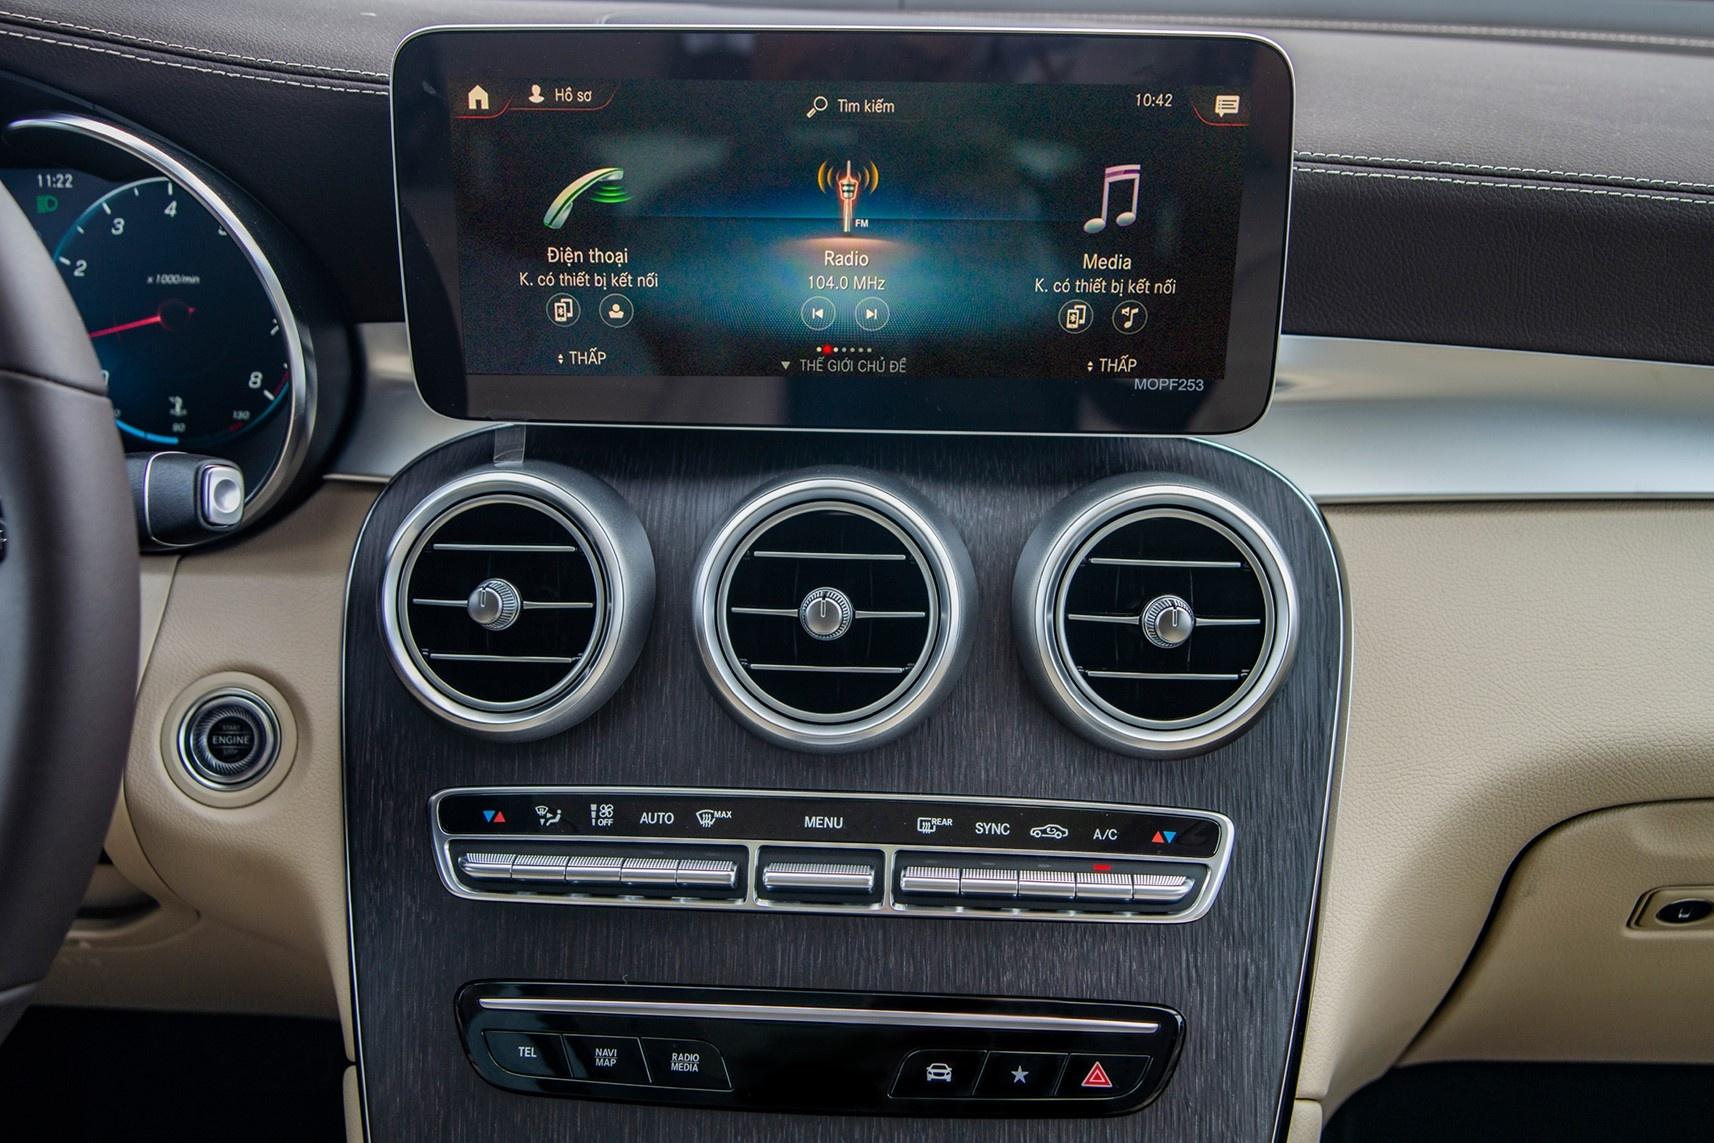 Audi Q5 2021 canh tranh Mercedes GLC anh 10